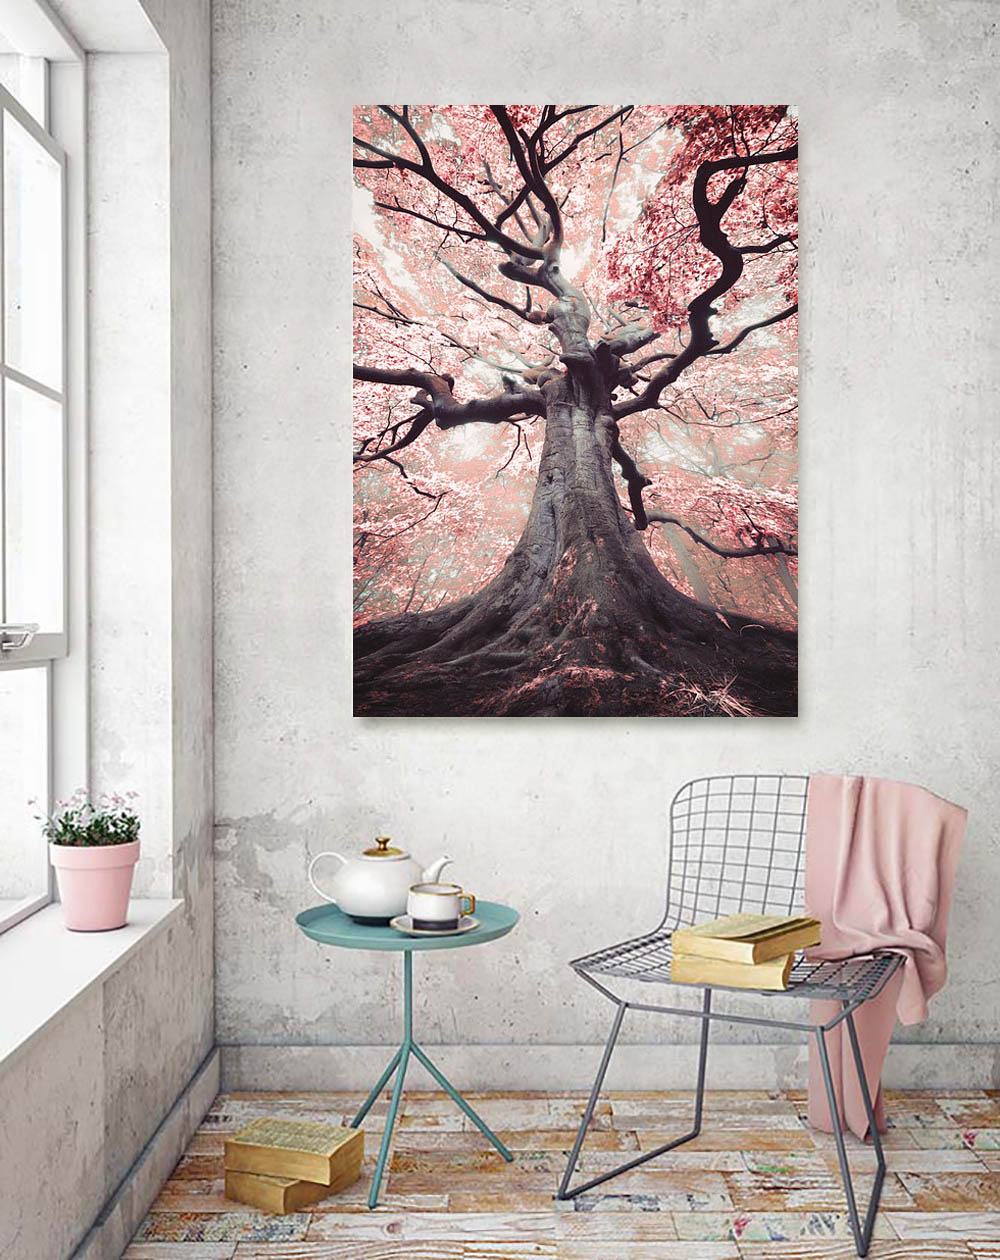 Tree art on canvas